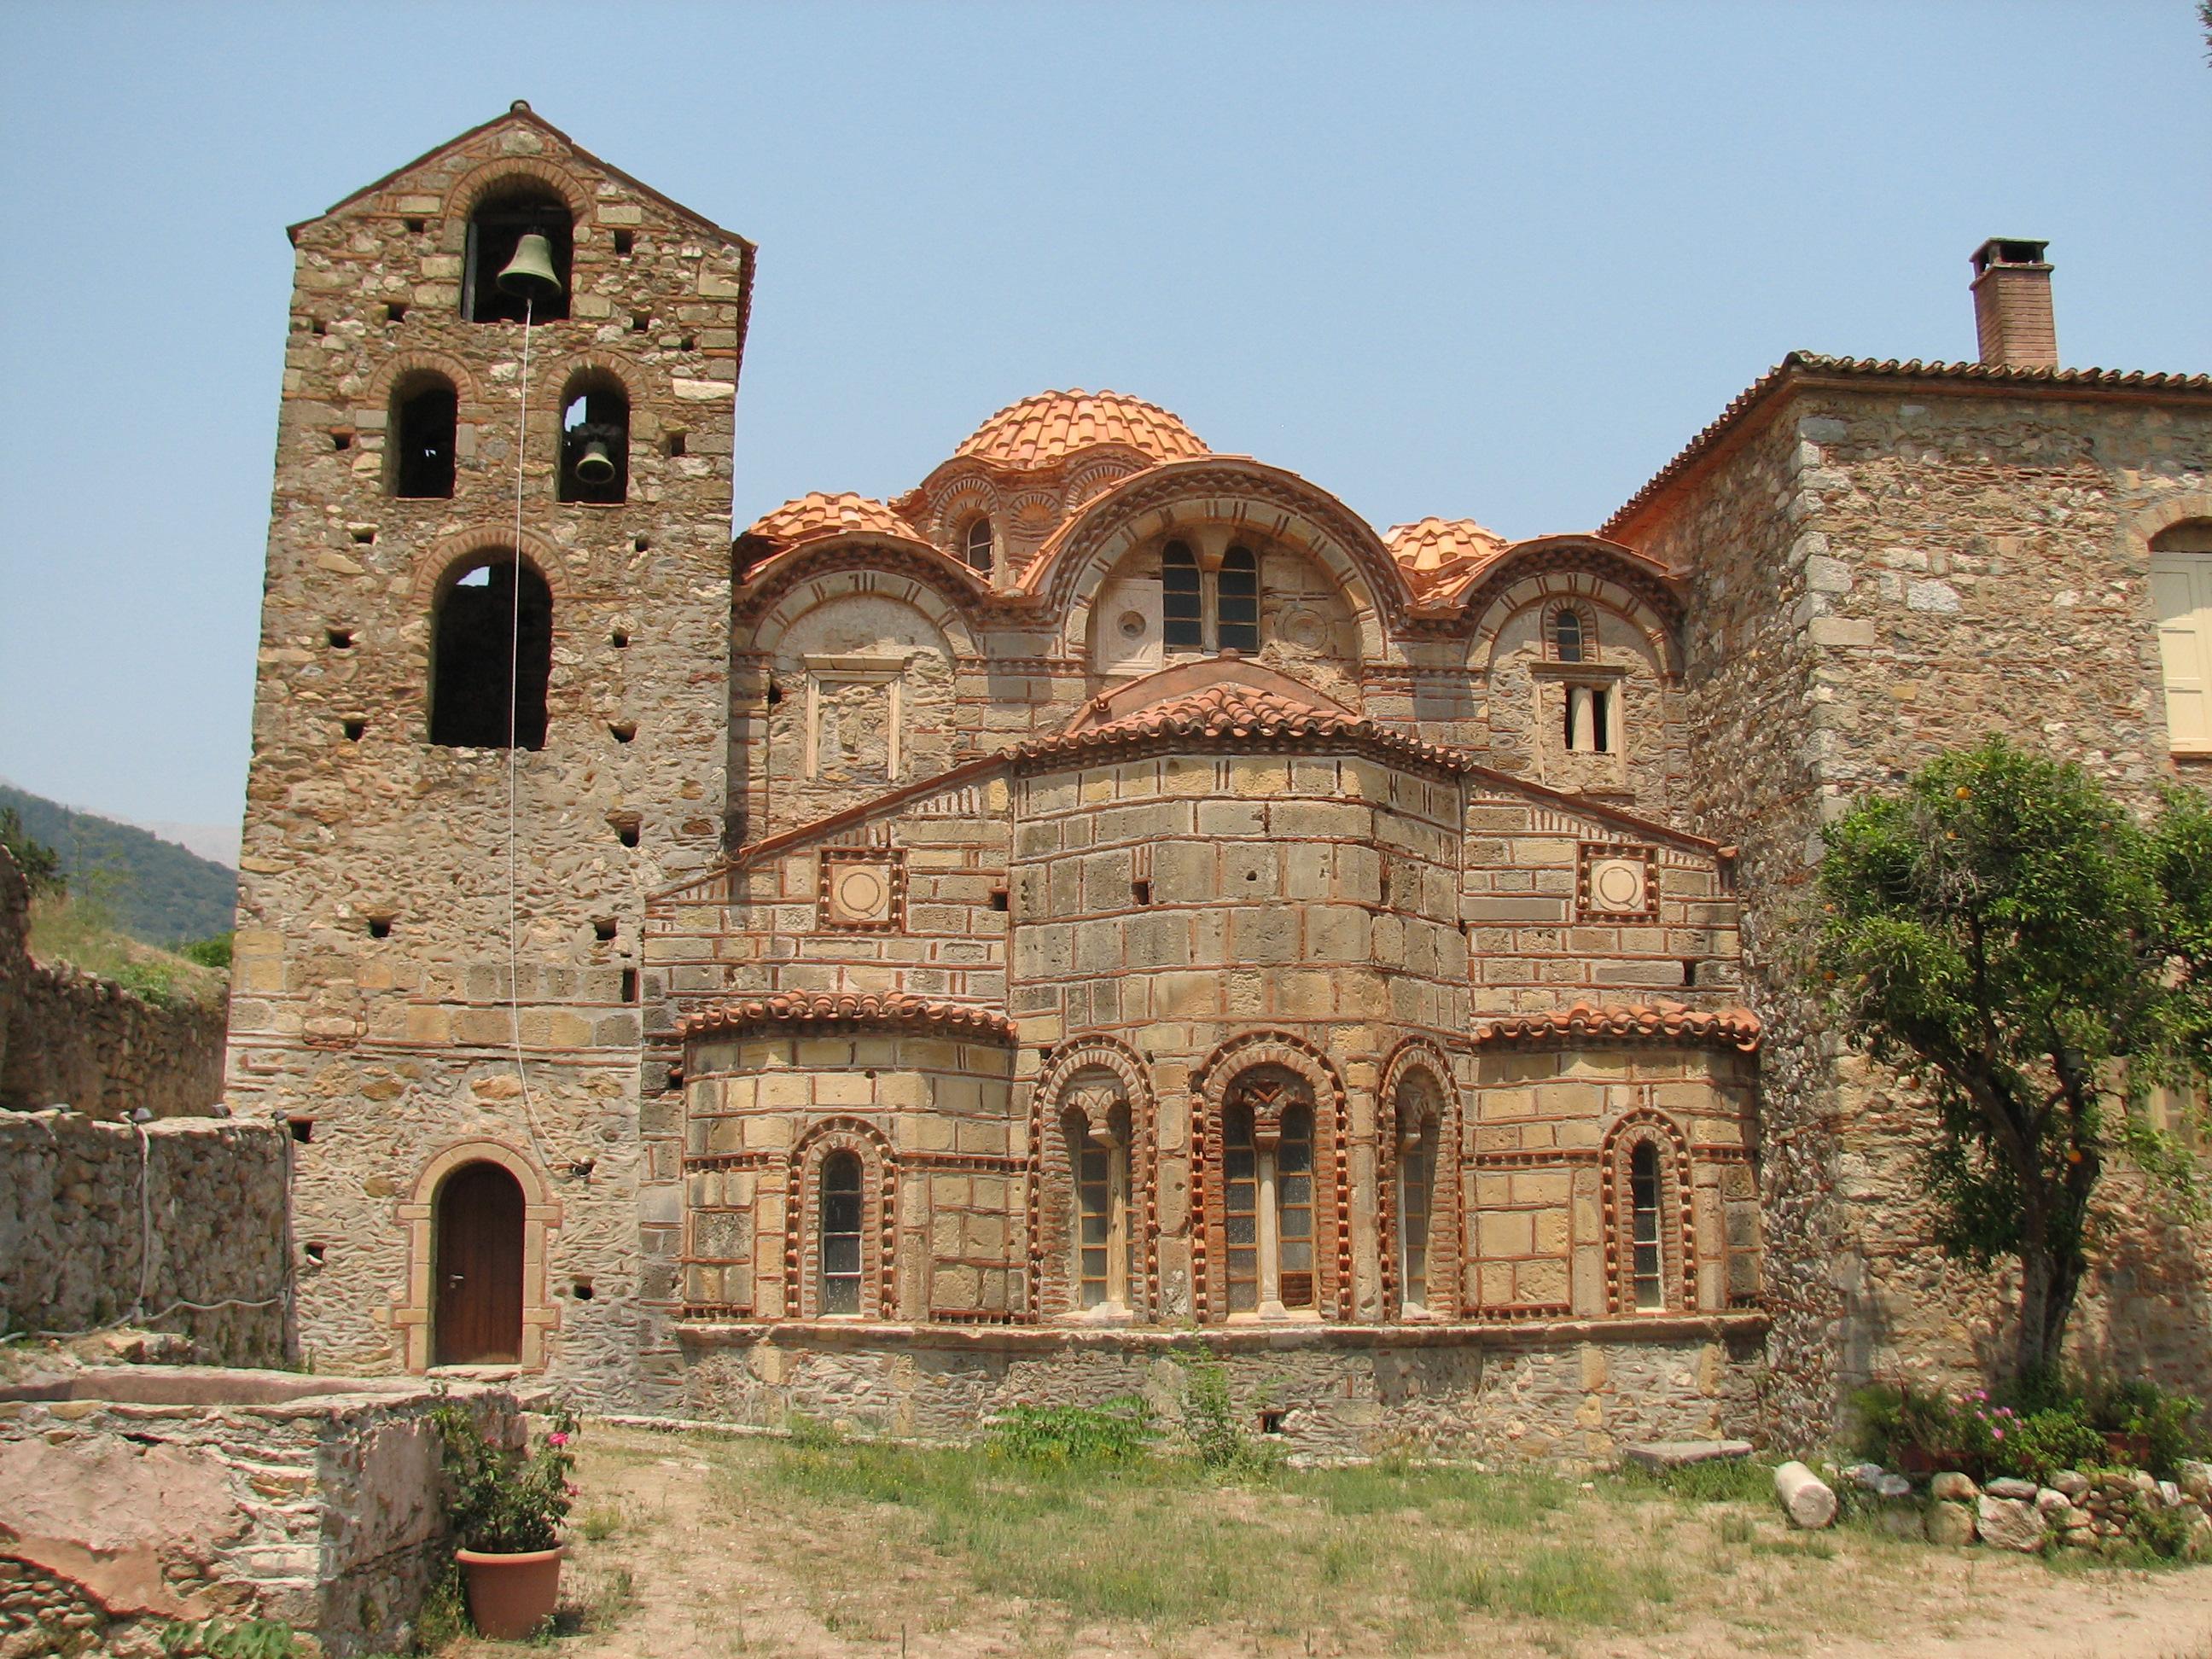 Metropolis de Mystras. Fuente: Wikimedia